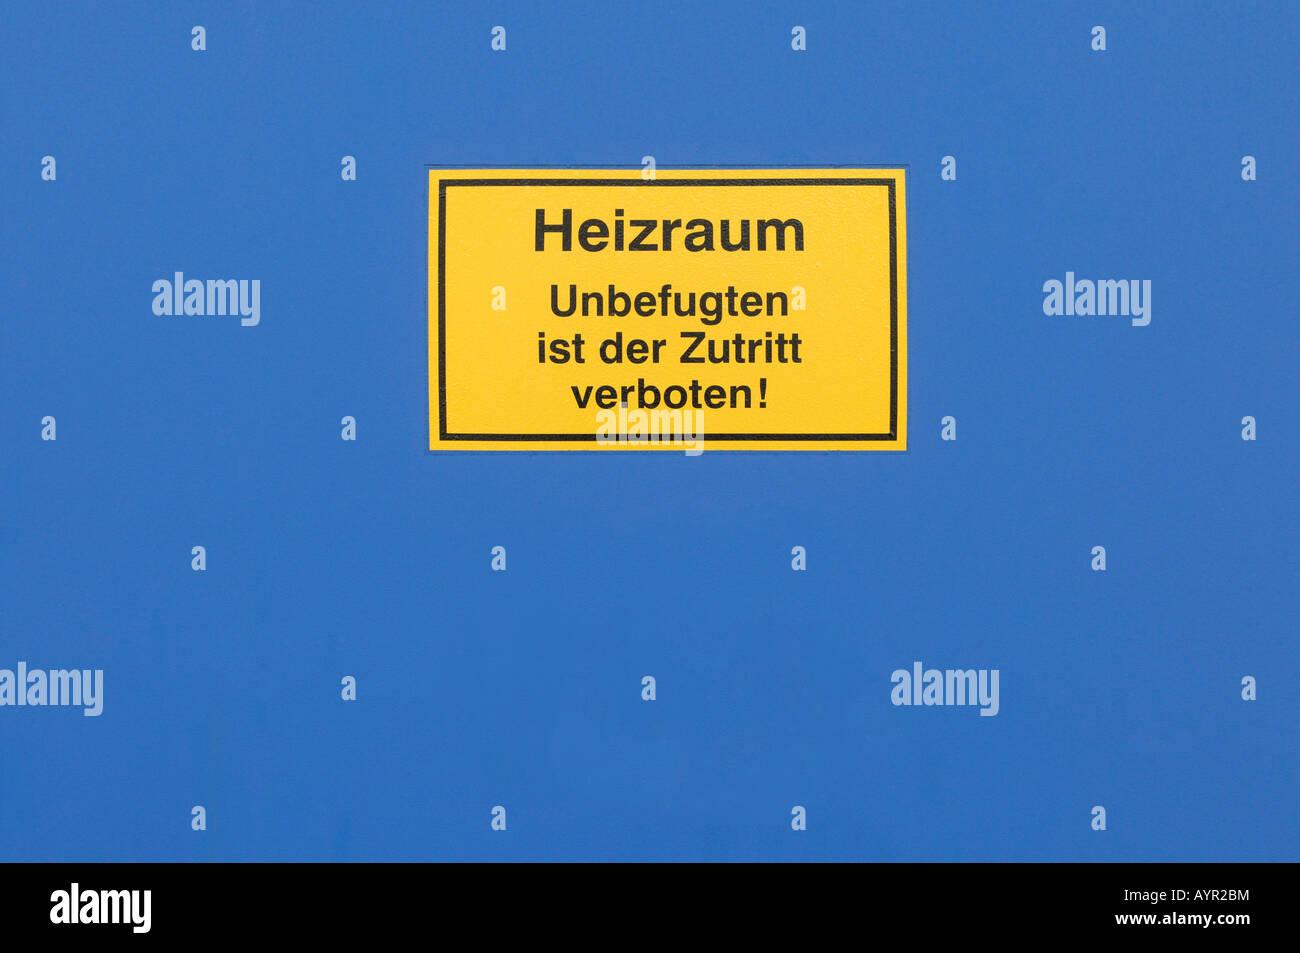 Sign on a blue steel door: 'boiler room, no entrance' (German) - Stock Image